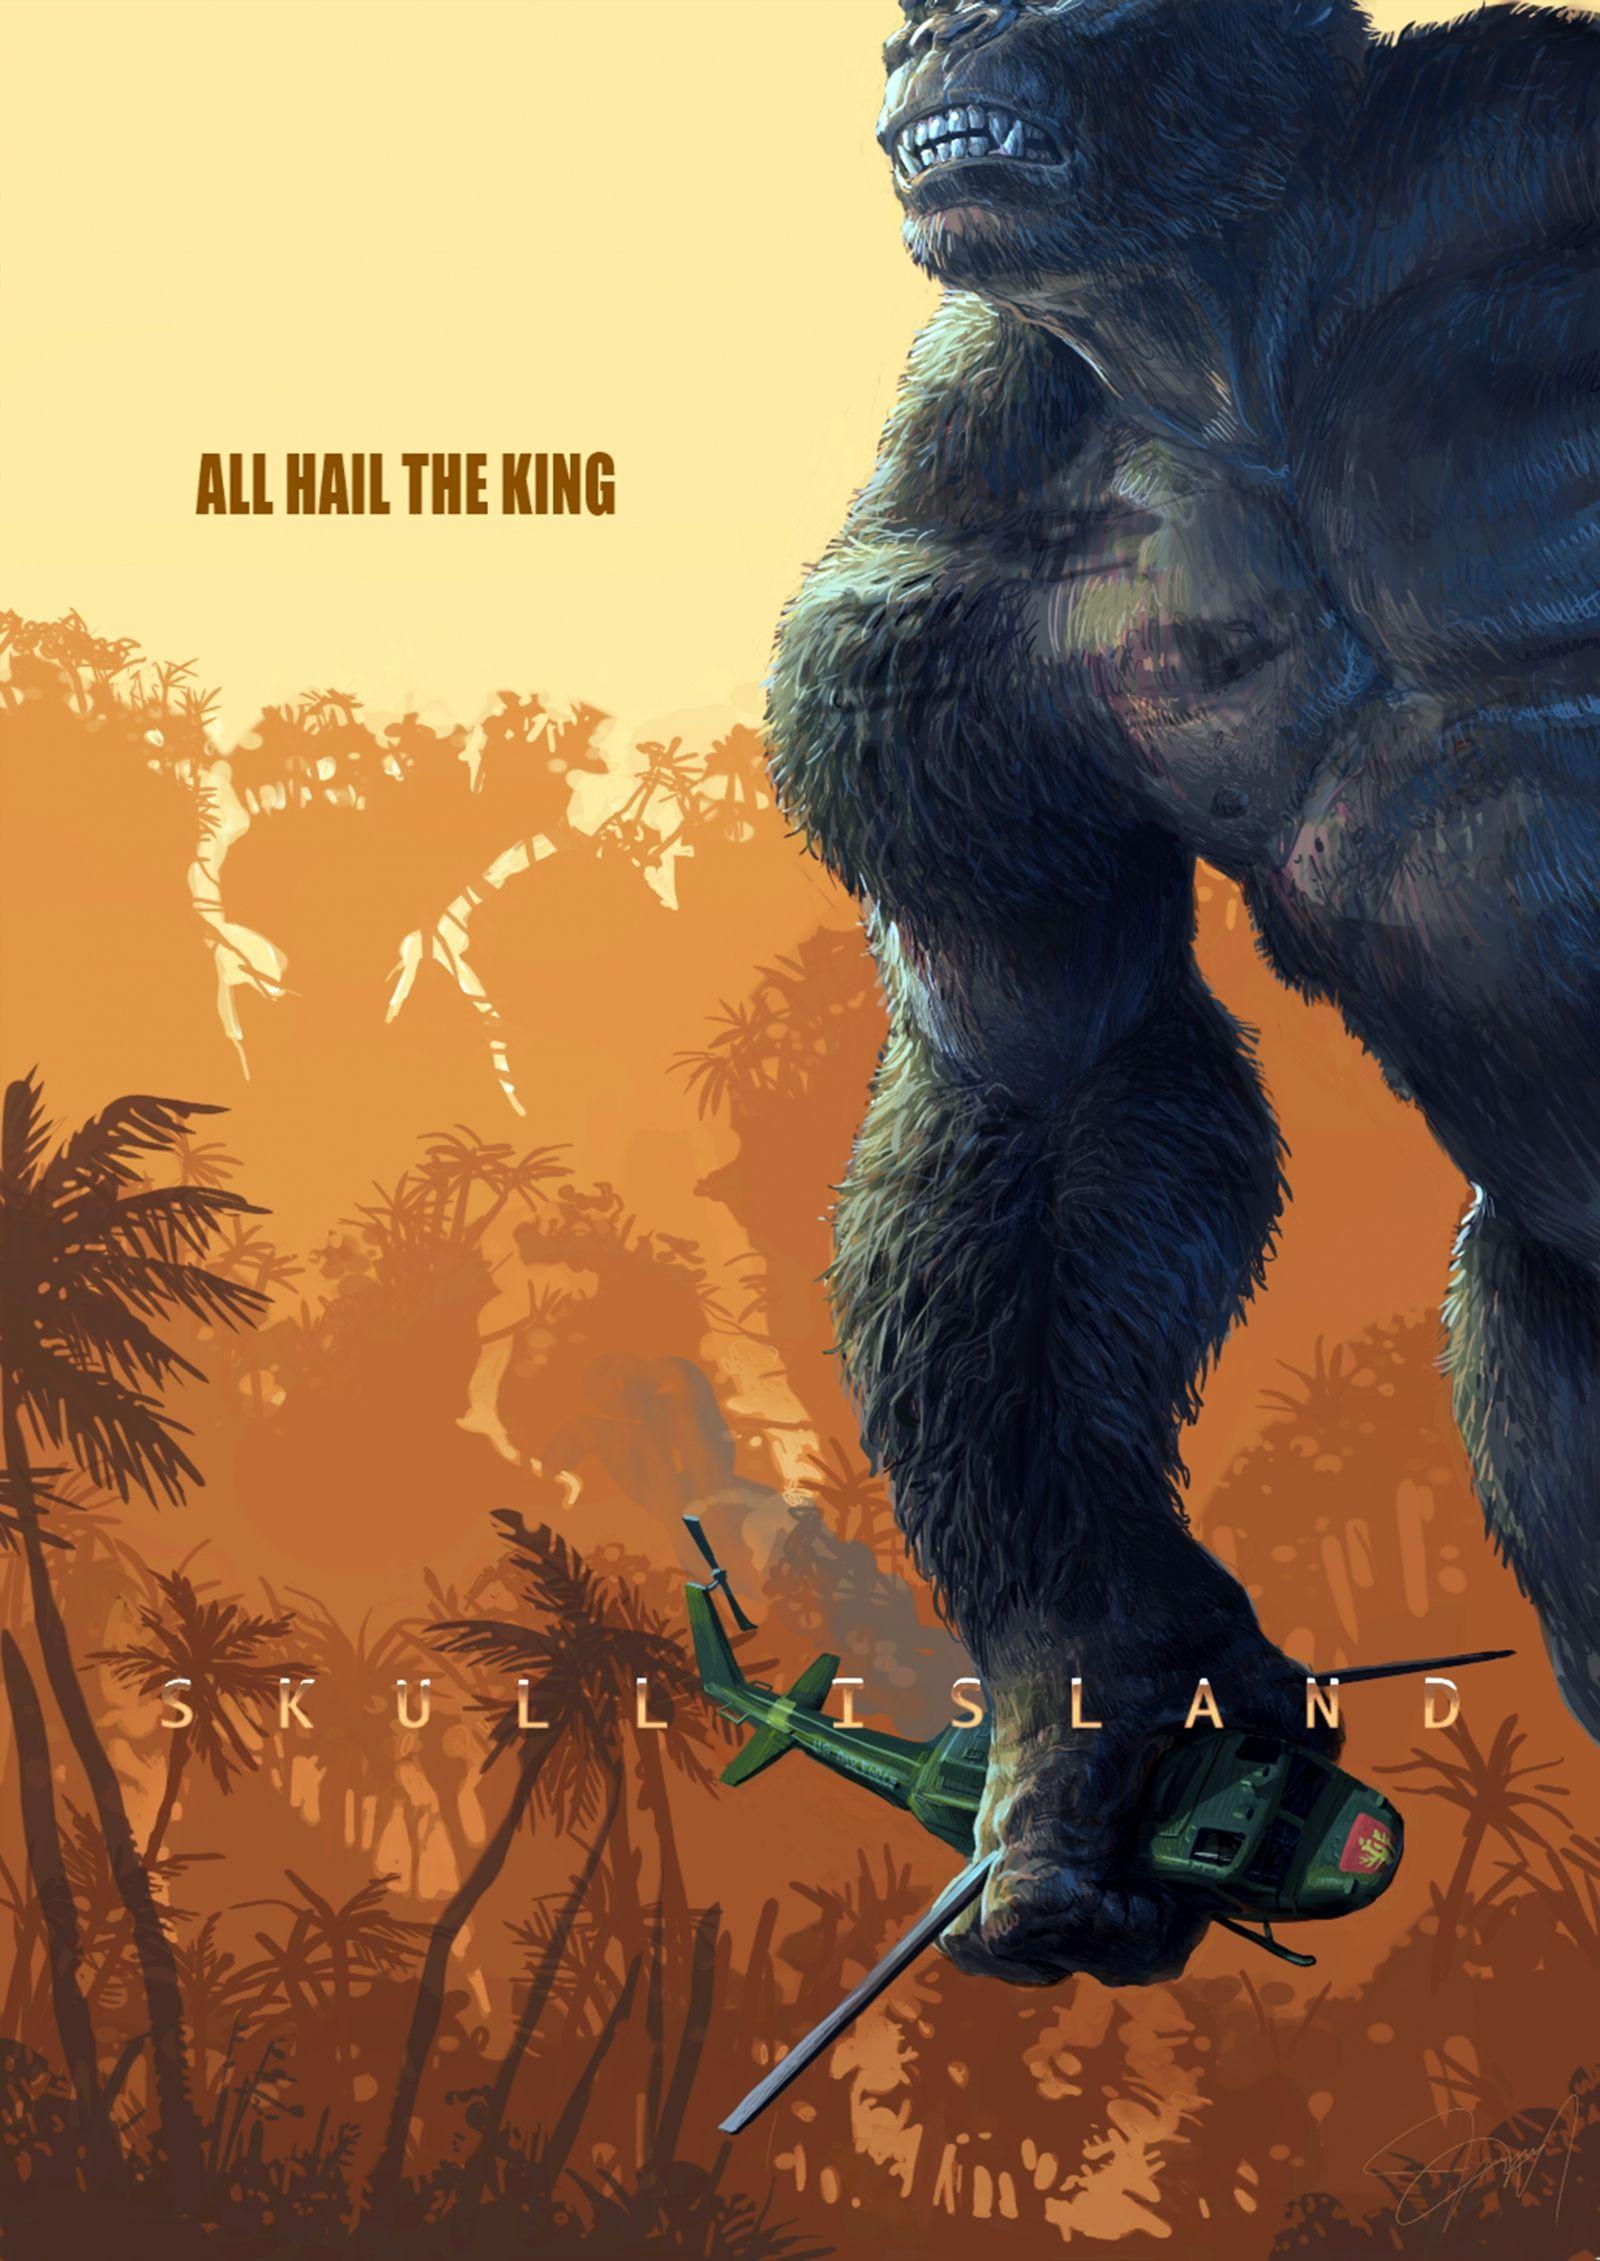 Kong skull island soundtrack on cd - Illustrated Poster For Upcoming Legendary Pictures Kong Skull Island By Myself Jaroslav Kosmina